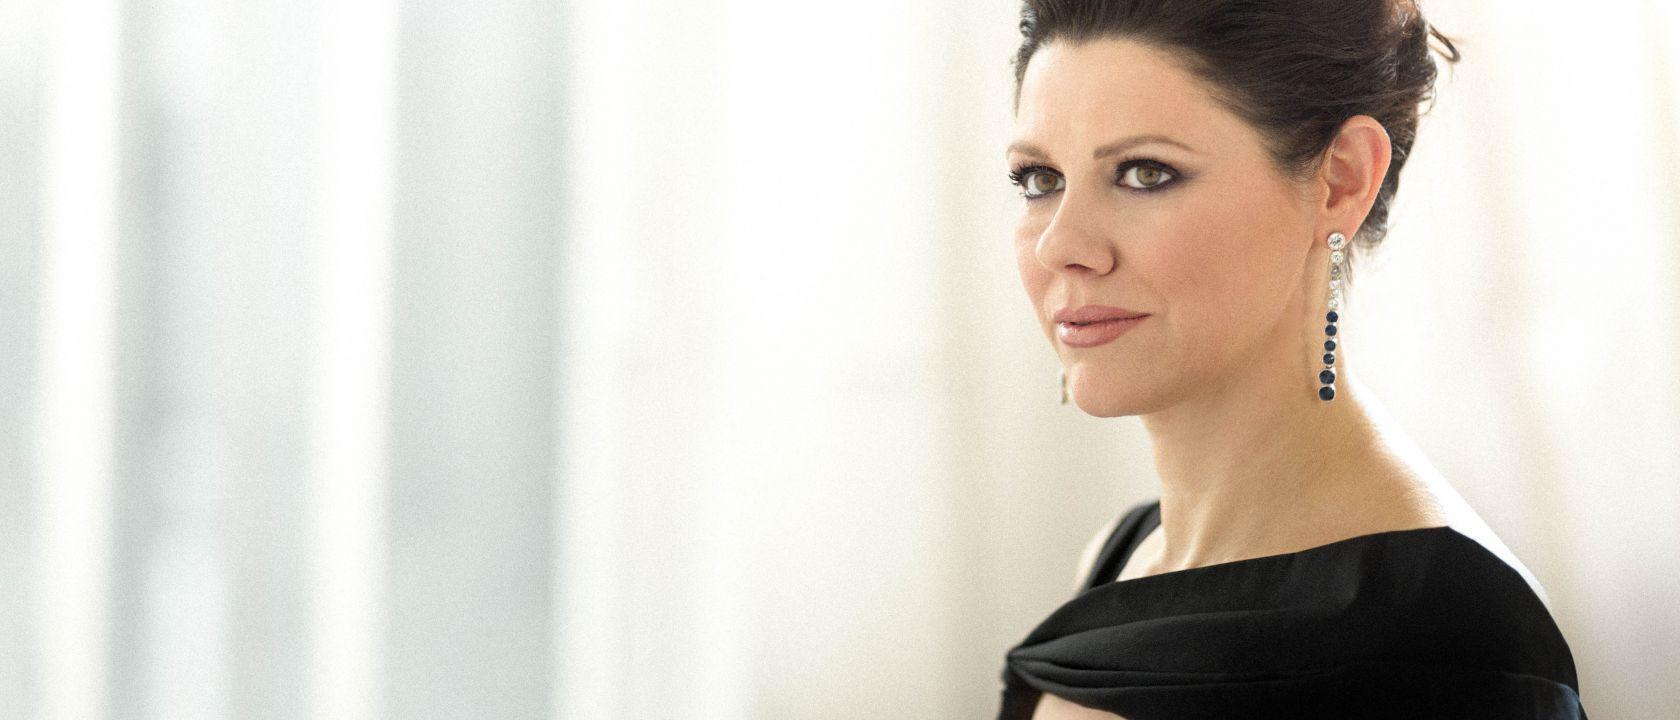 Tanja Ariane Baumgartner